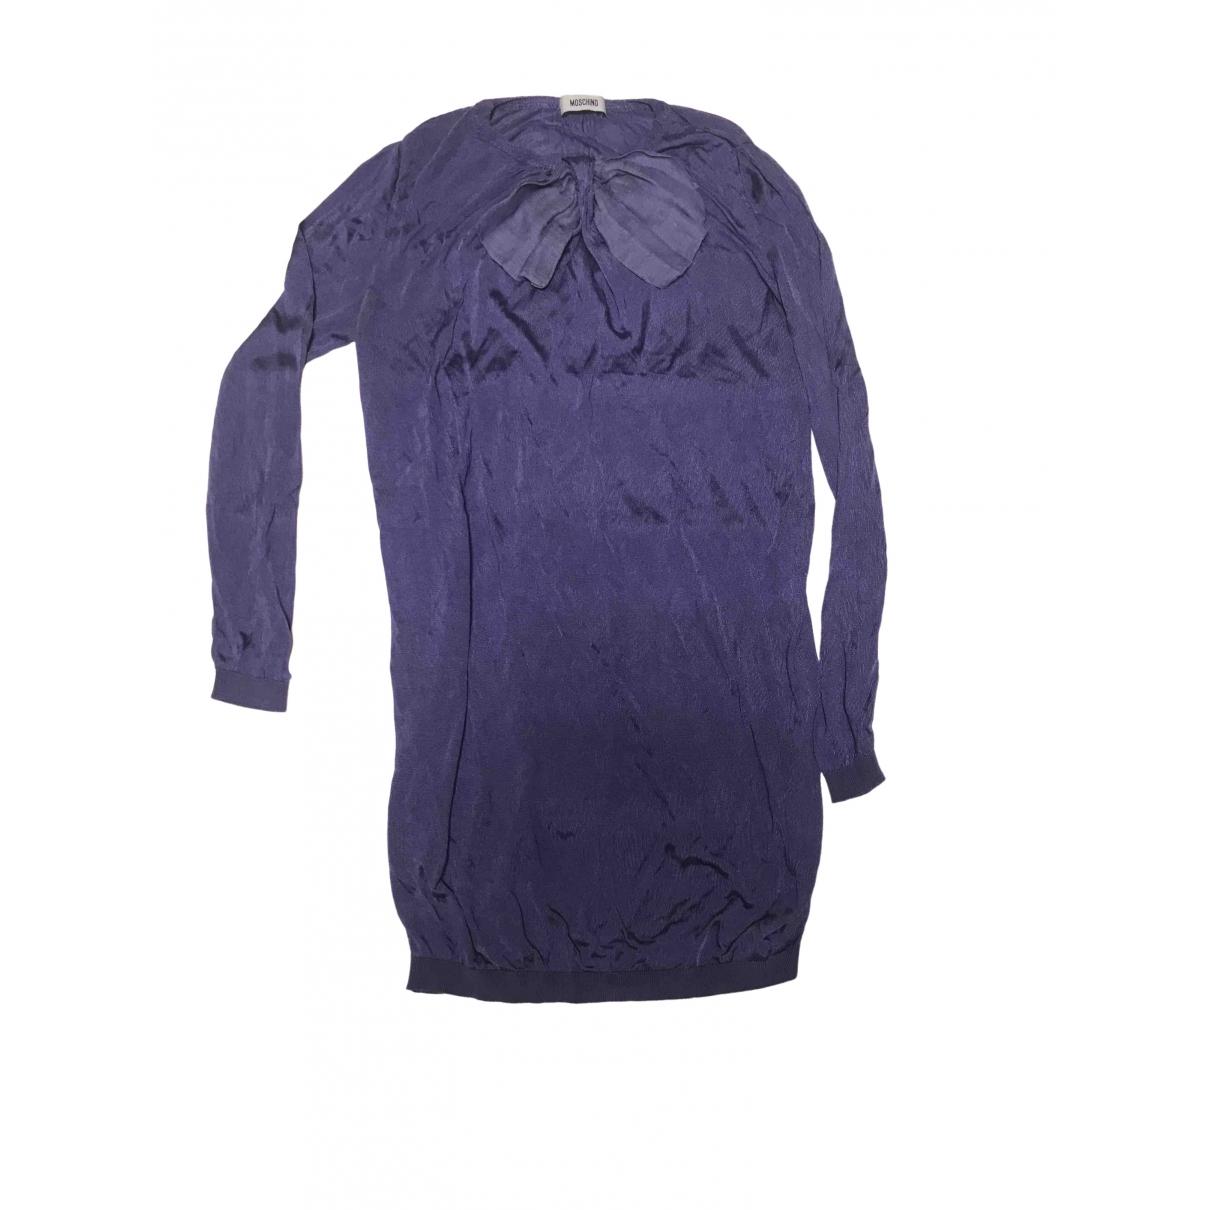 Moschino \N Kleid in  Lila Seide